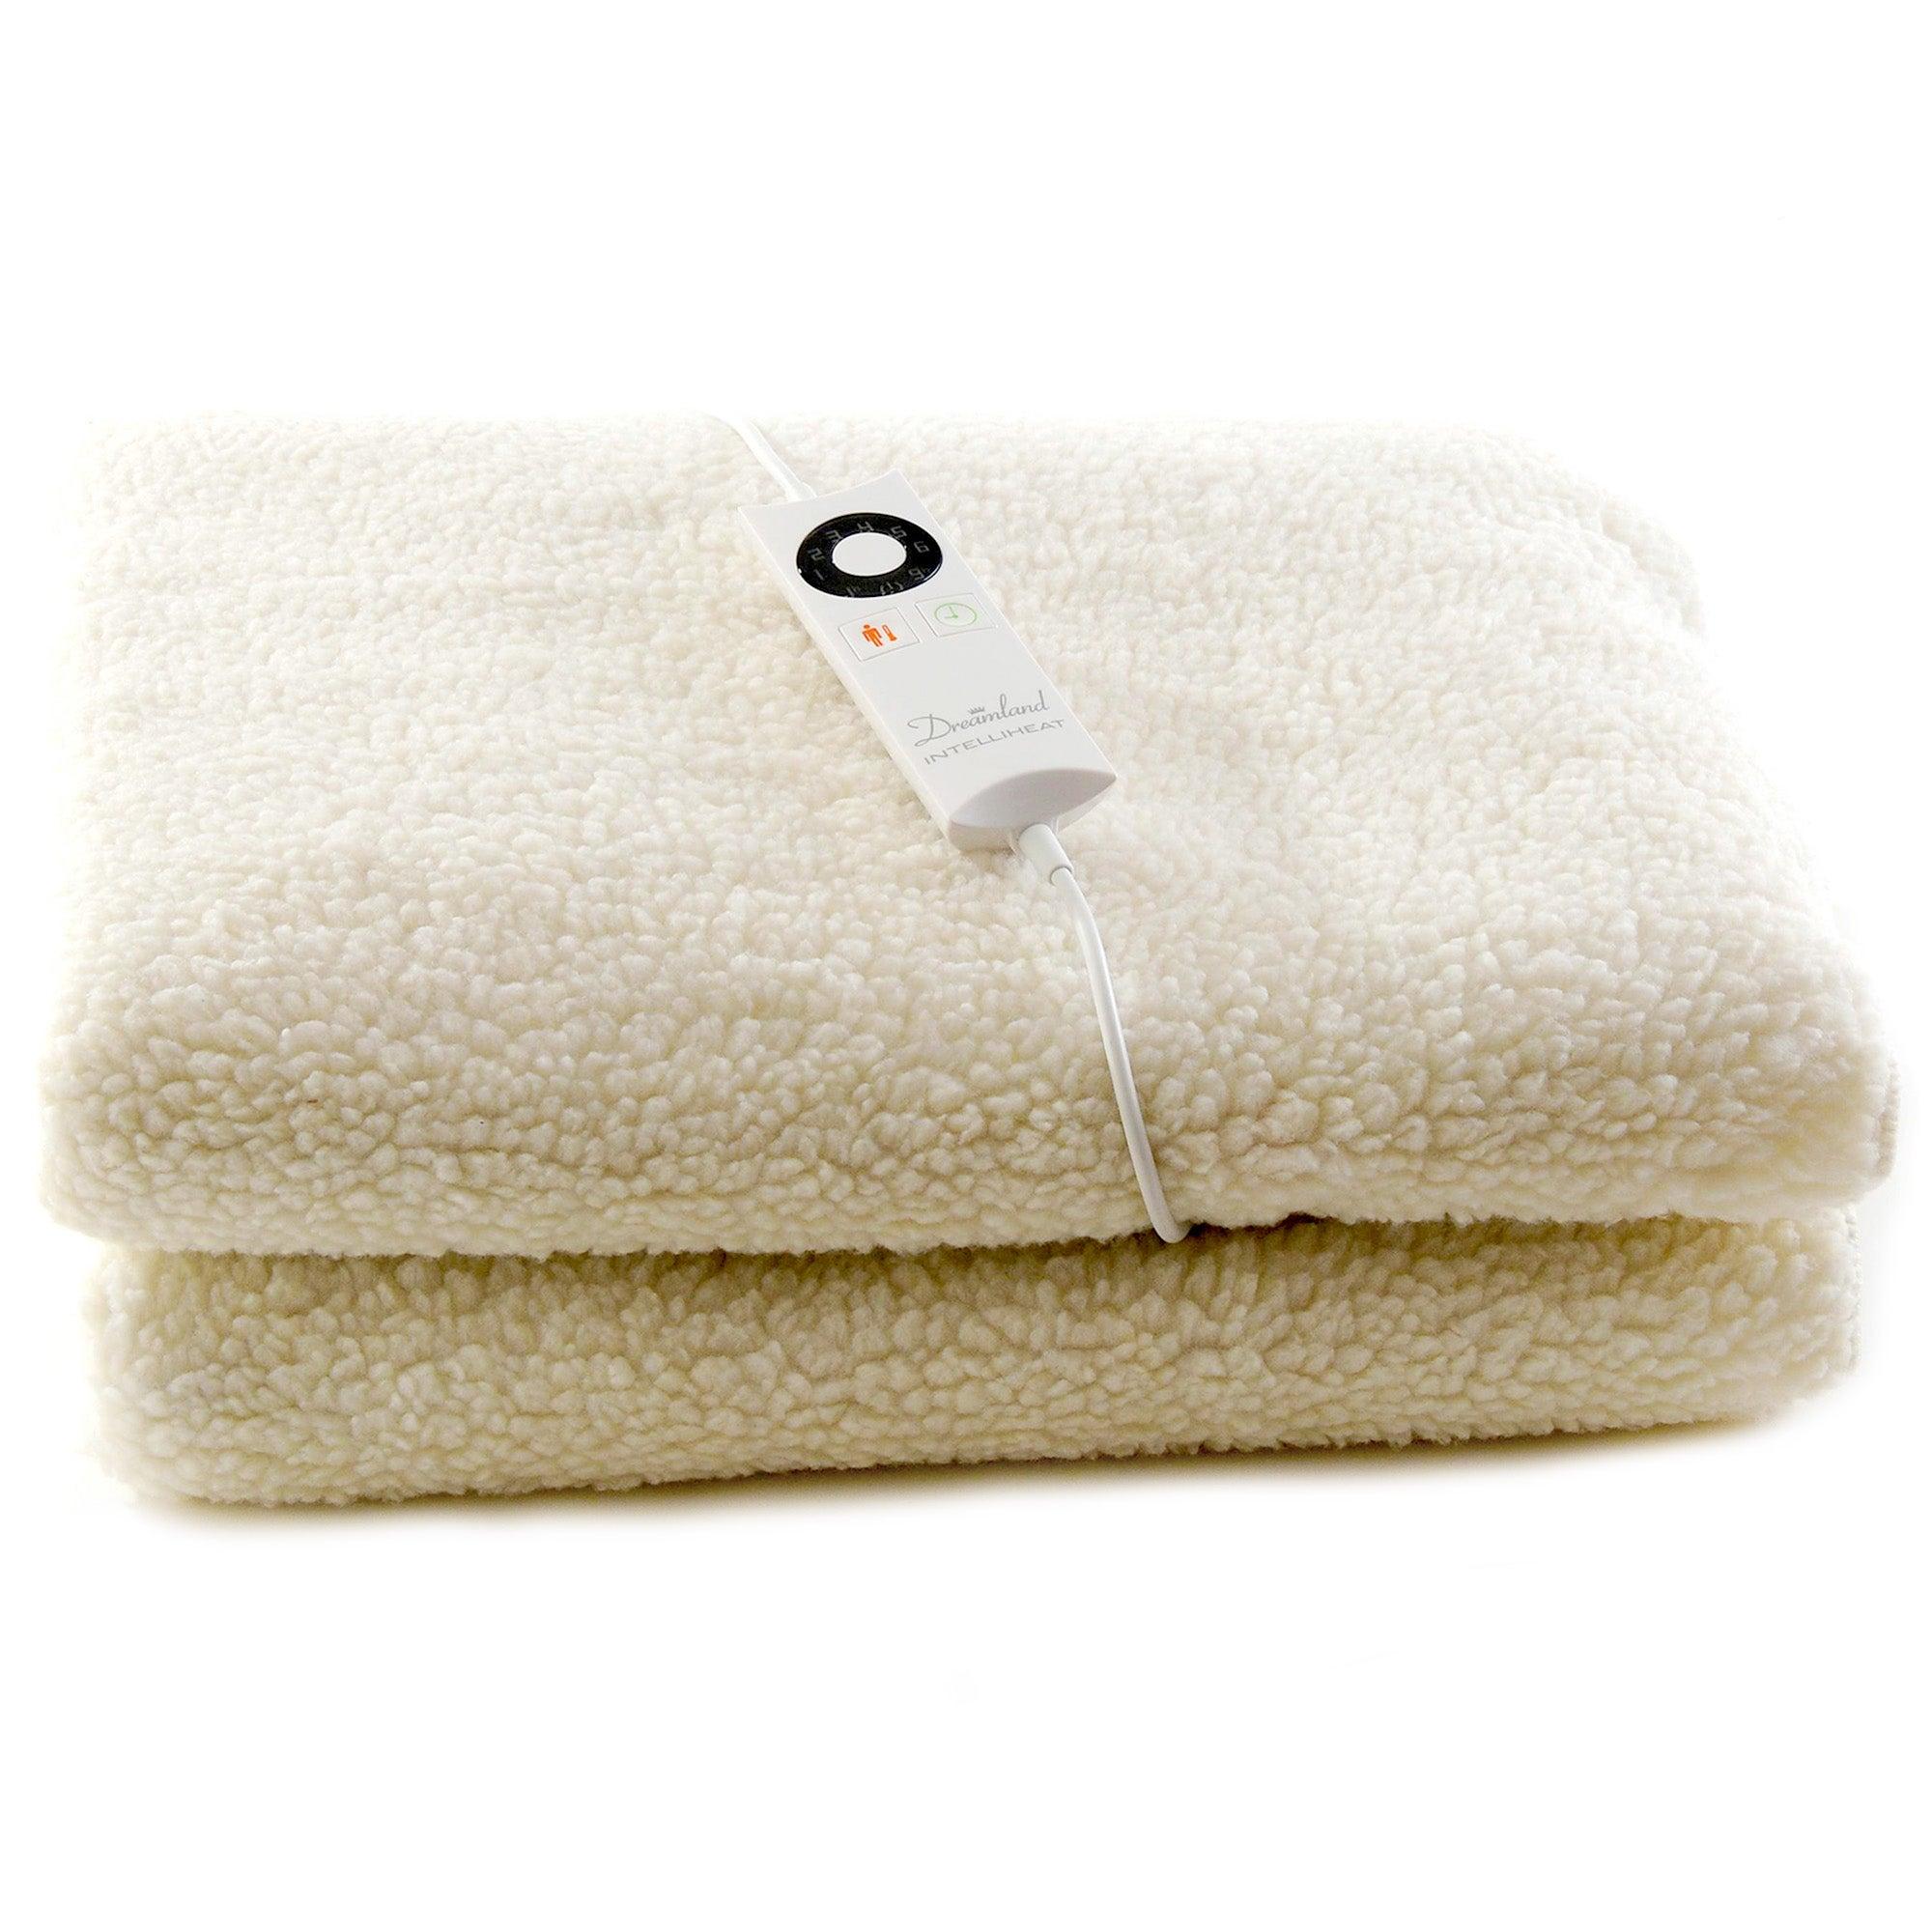 dreamland intelliheat electric blanket with control dunelm. Black Bedroom Furniture Sets. Home Design Ideas